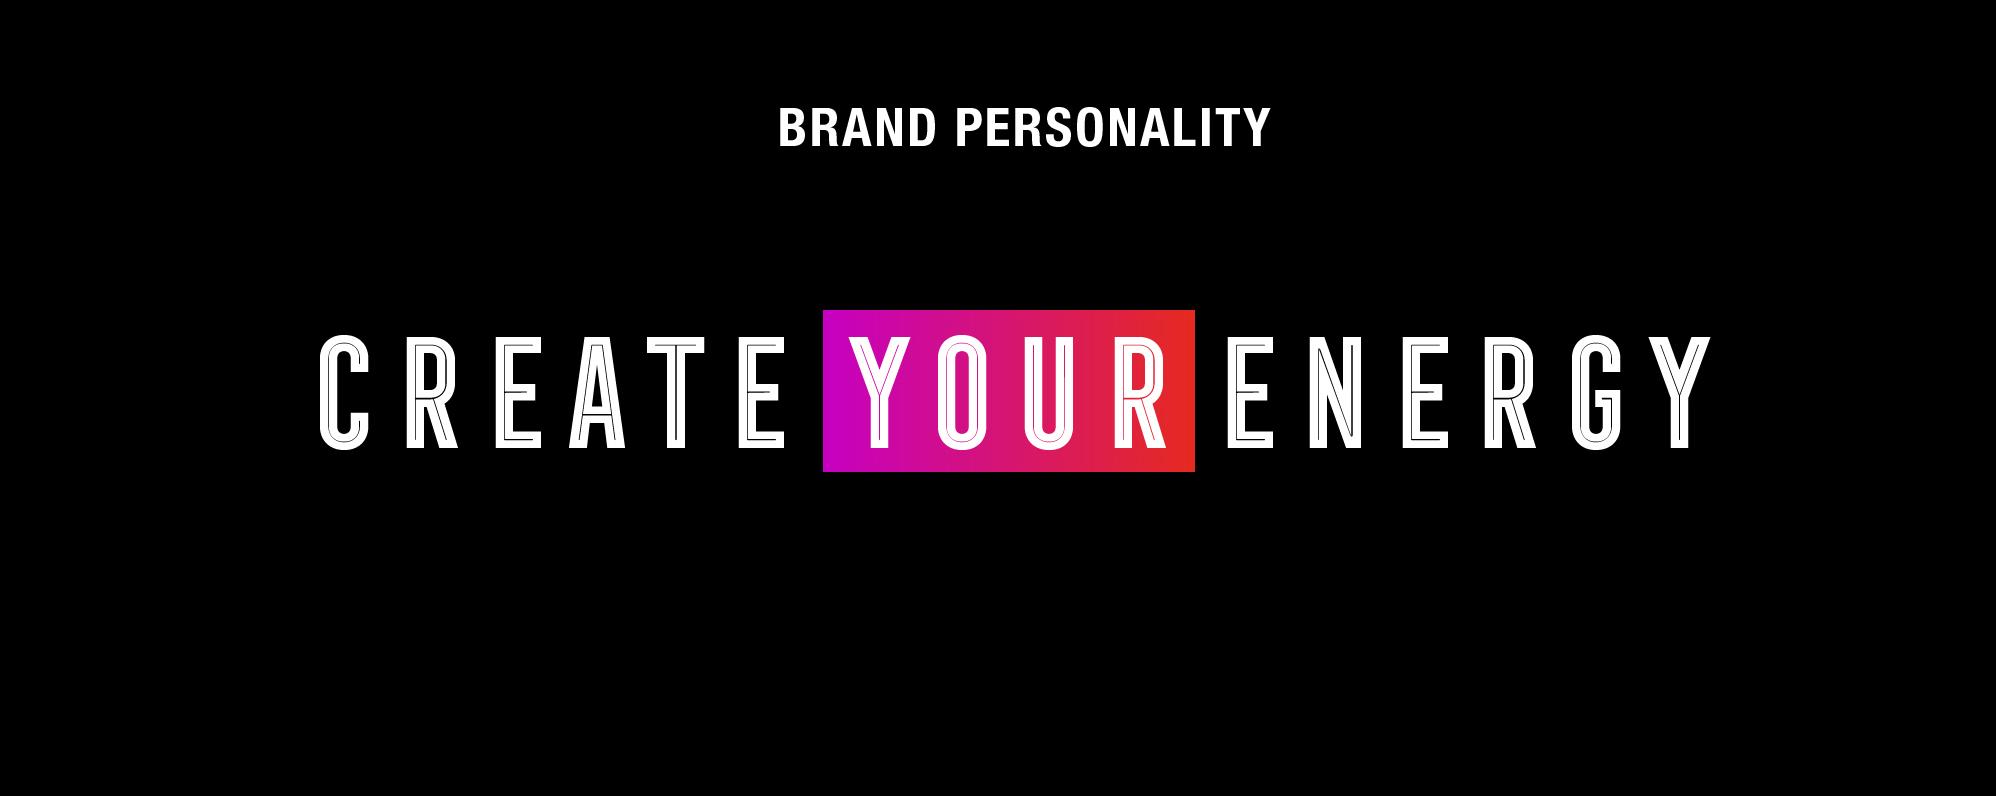 Burst personality-100.jpg